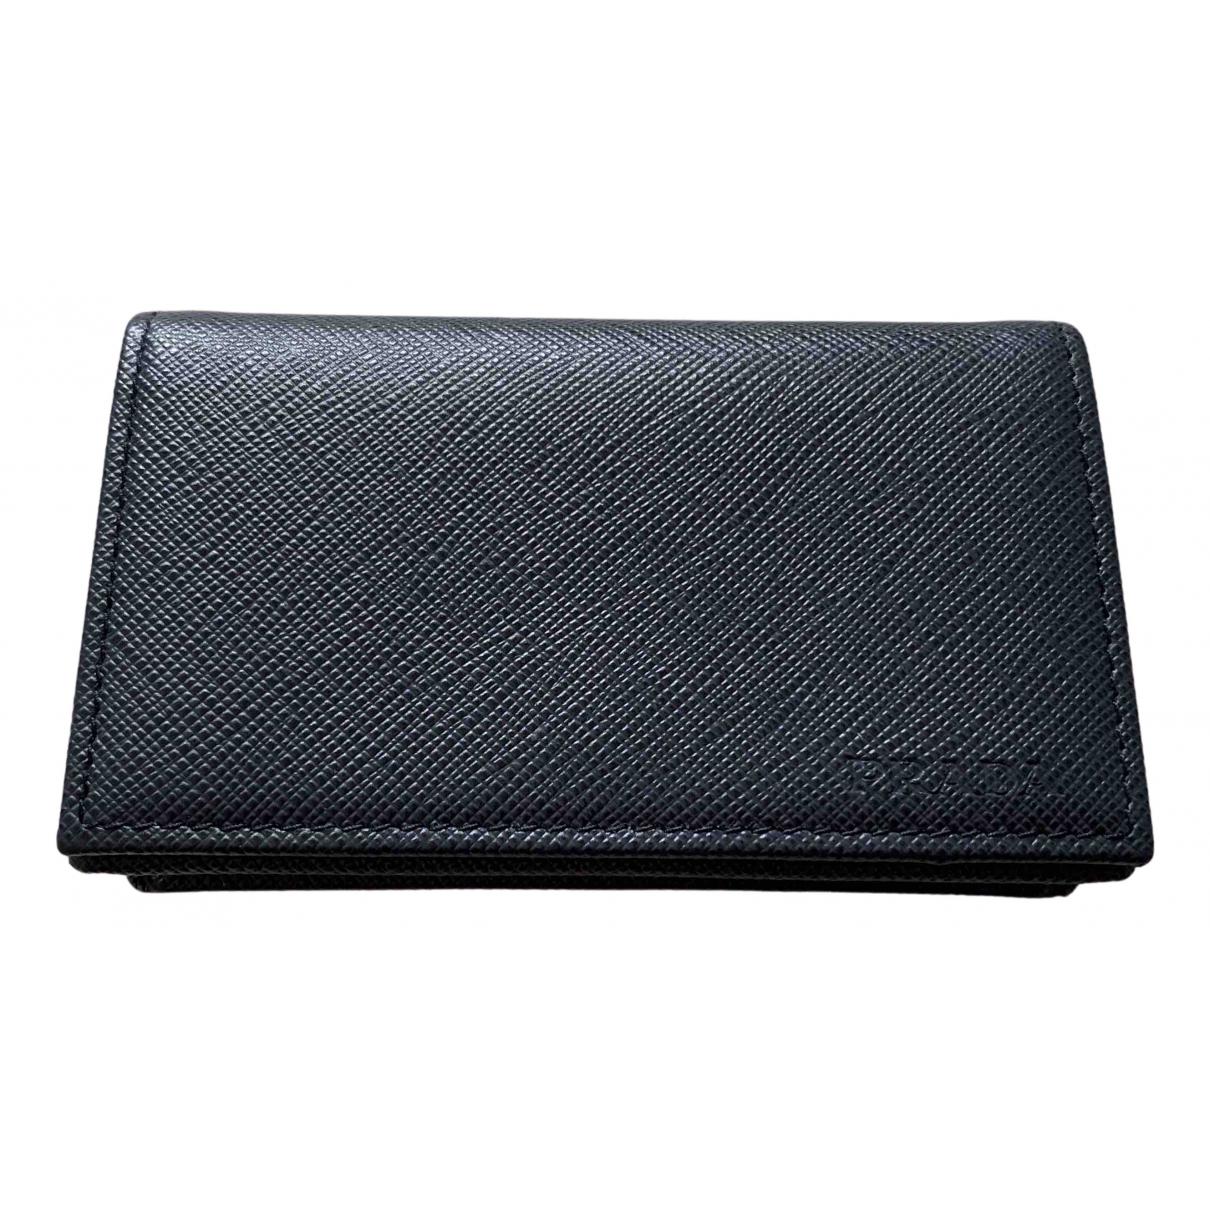 Prada N Navy Leather Small bag, wallet & cases for Men N